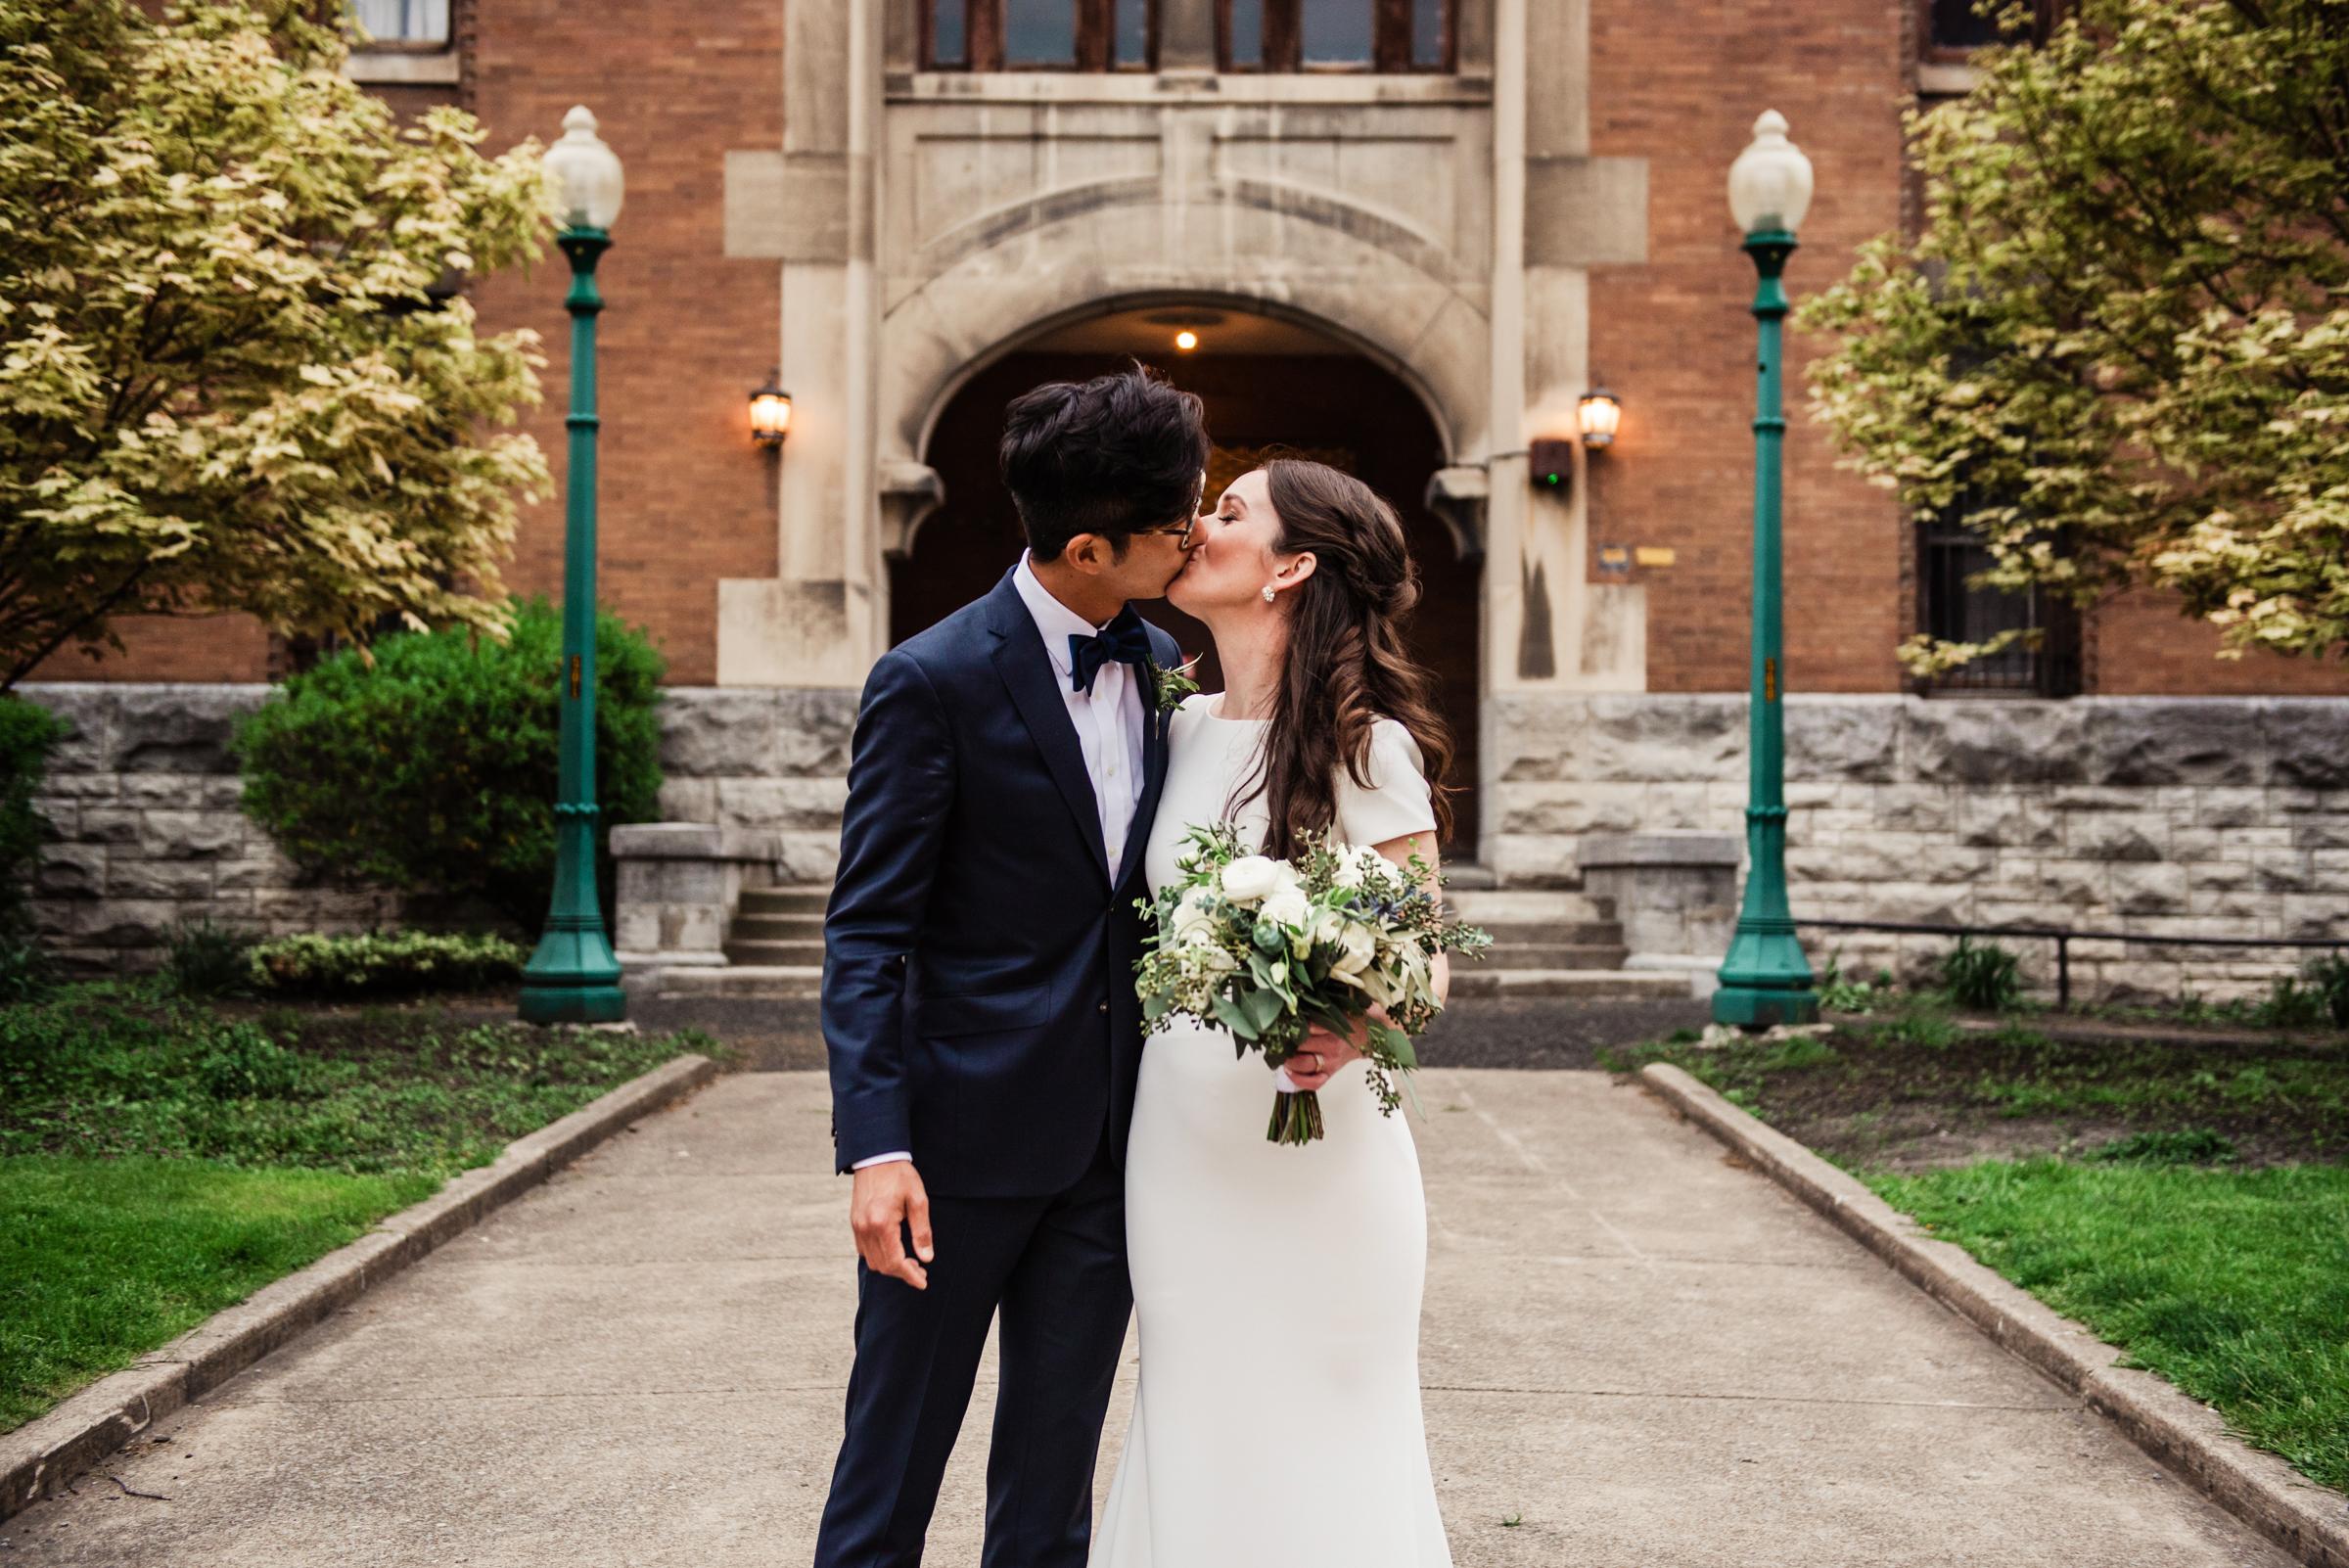 SKY_Armory_Syracuse_Wedding_JILL_STUDIO_Rochester_NY_Photographer_DSC_6227.jpg